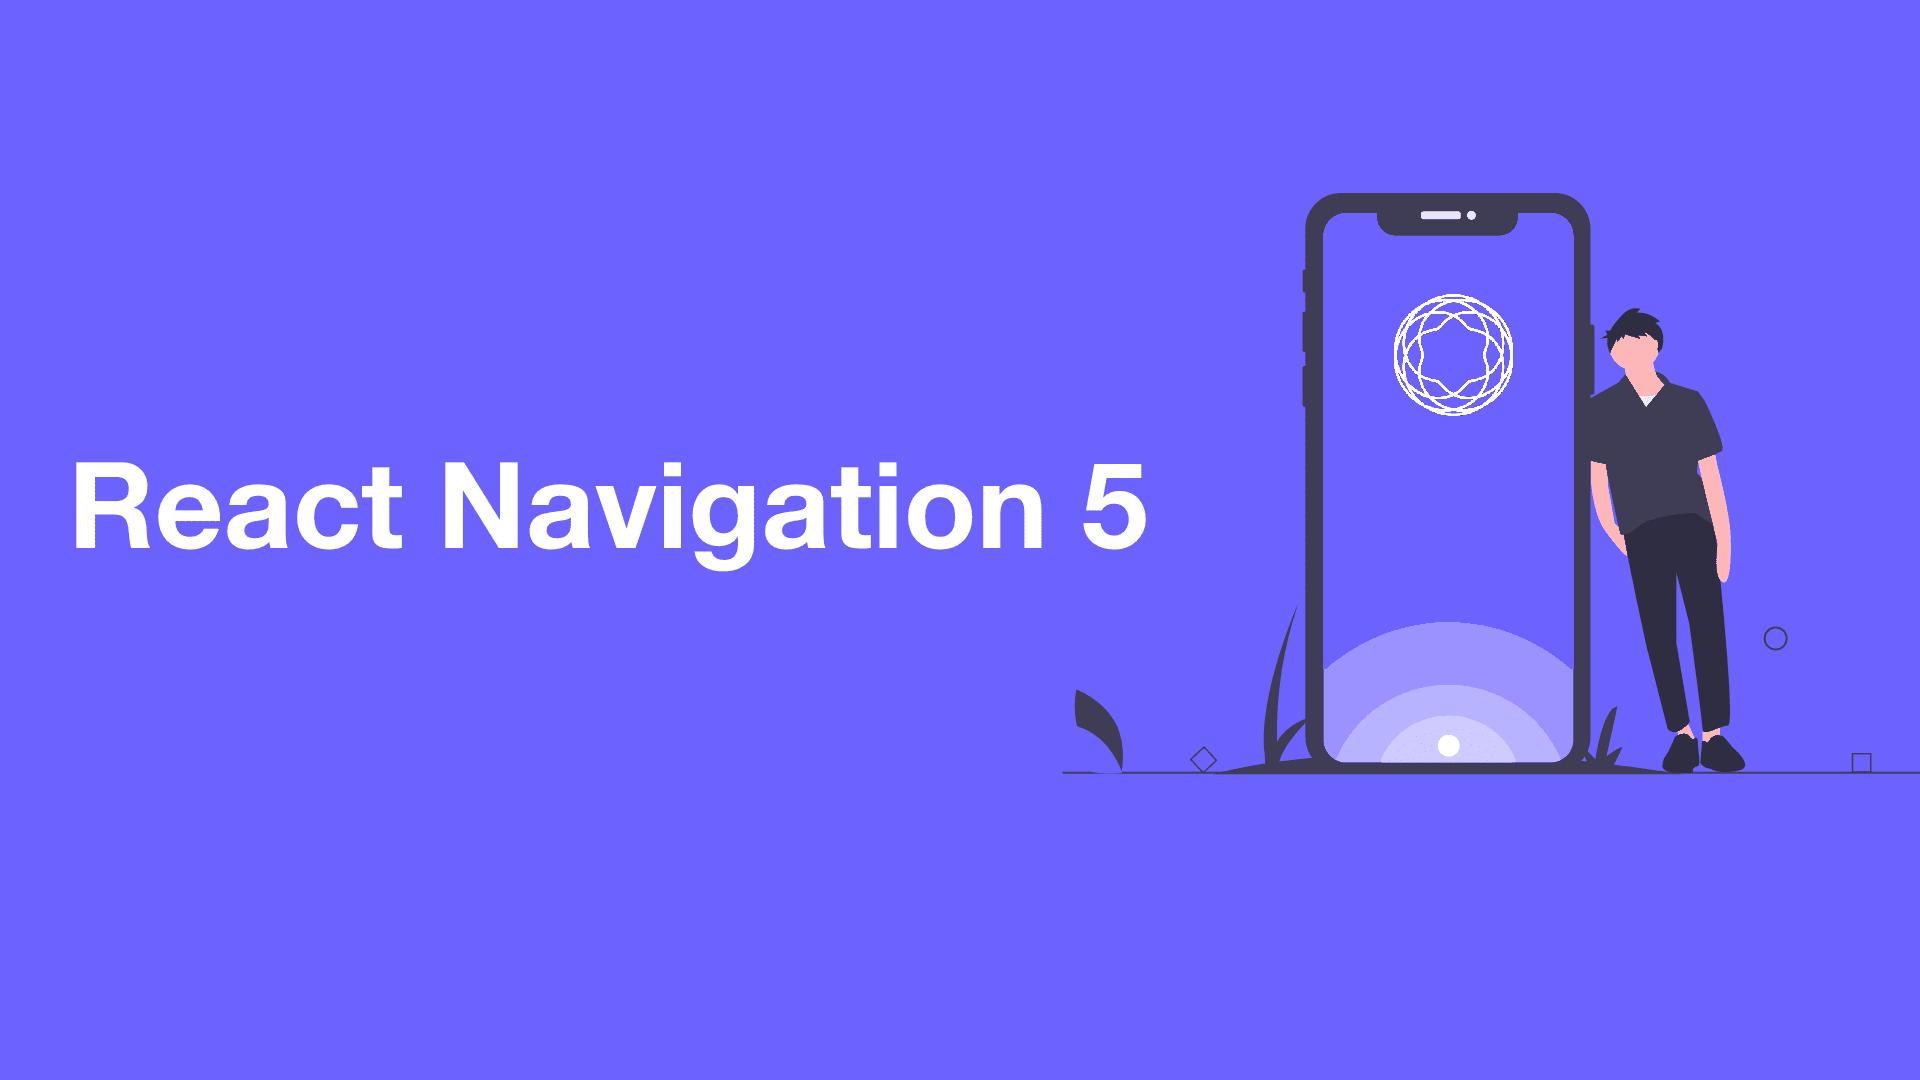 react navigation 5